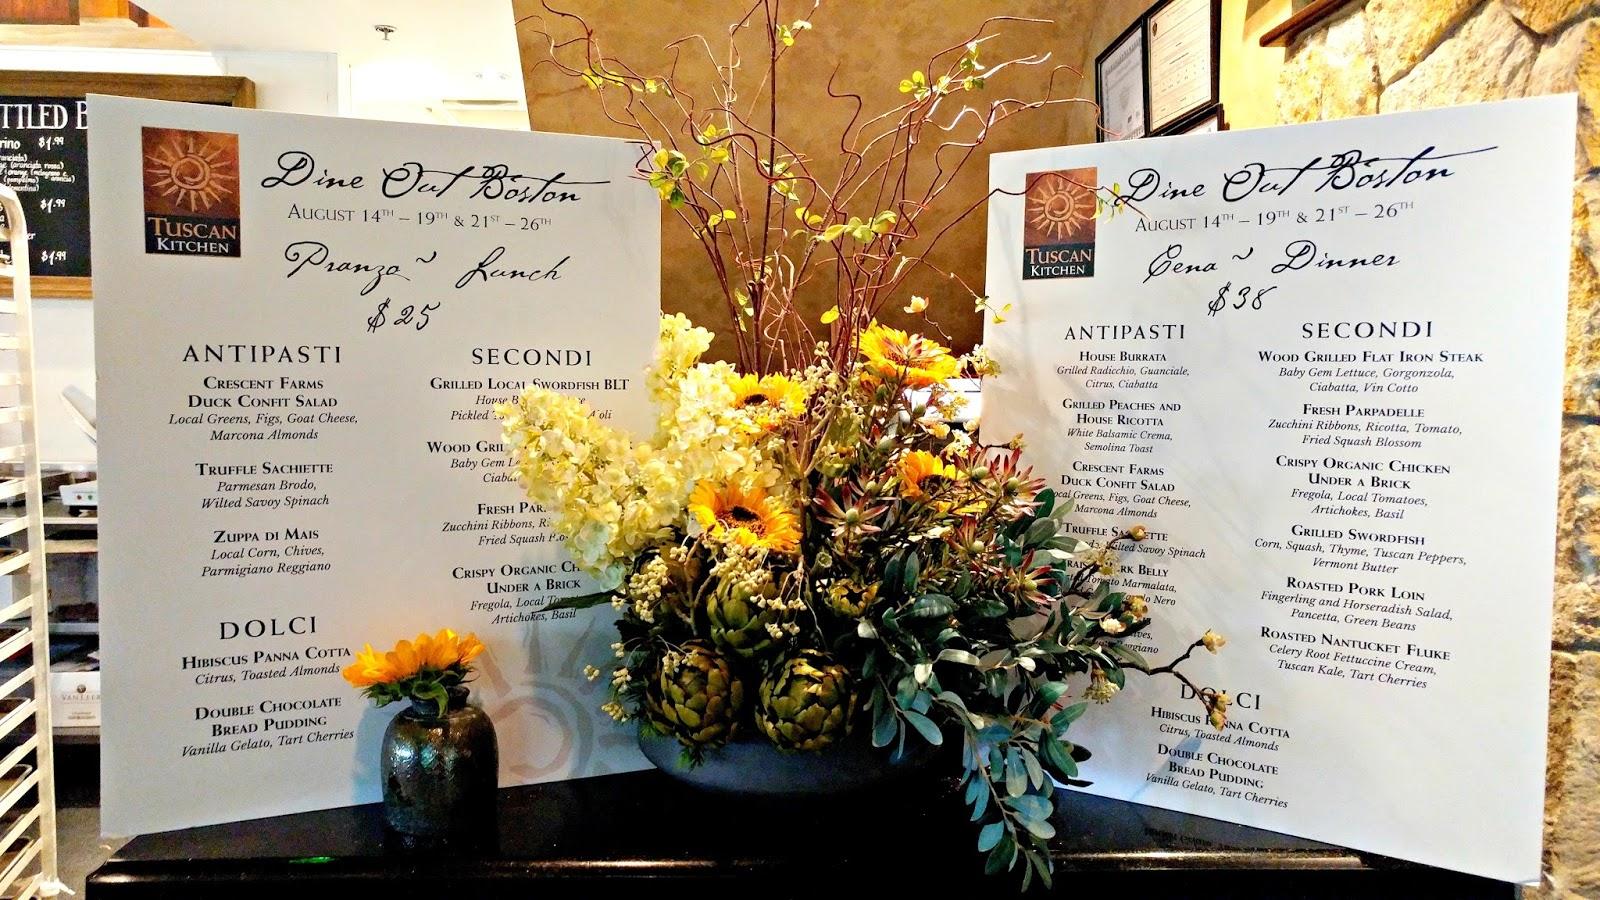 Mami-Eggroll: Dine out Boston Summer 2016: Tuscan Kitchen Burlington